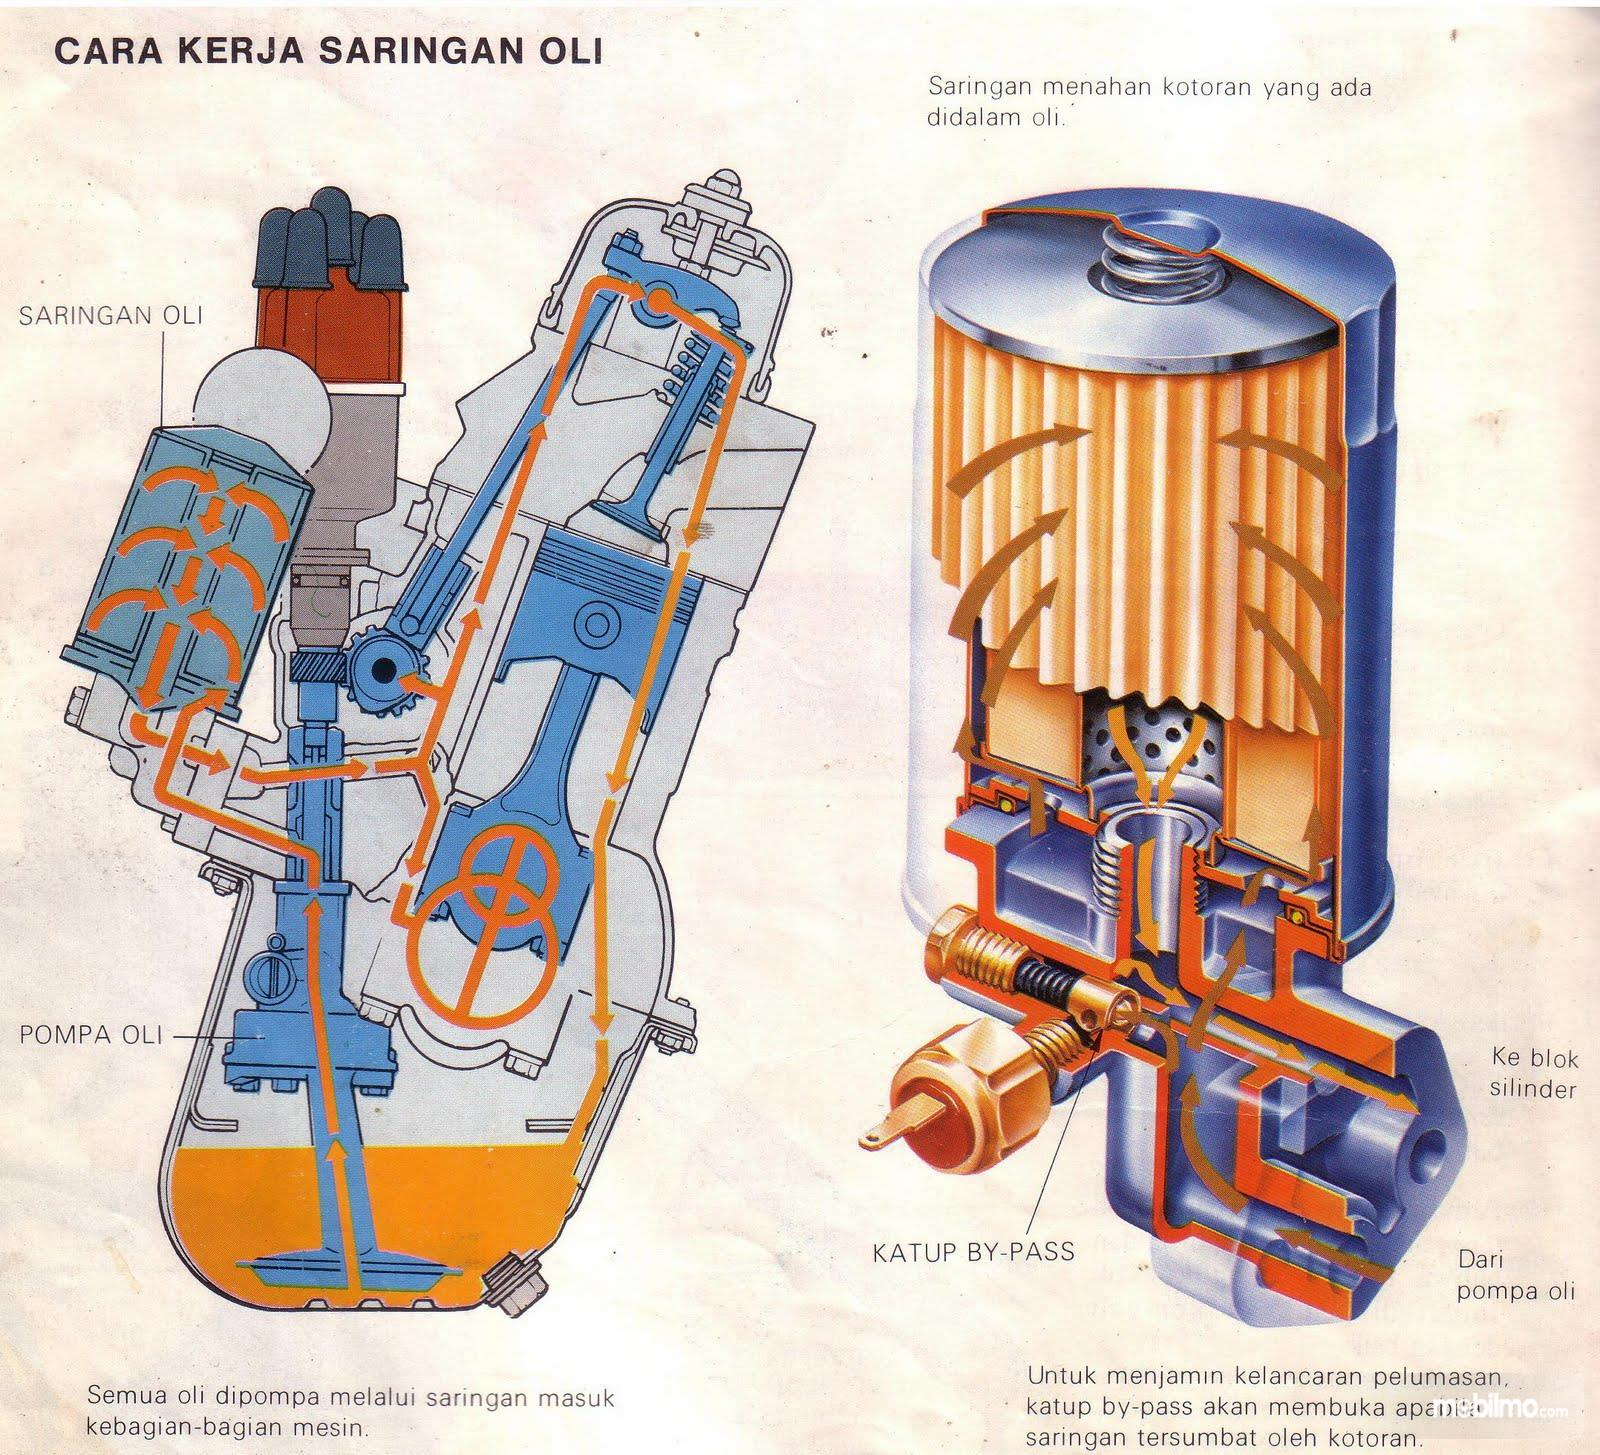 Cara kerja saringan oli